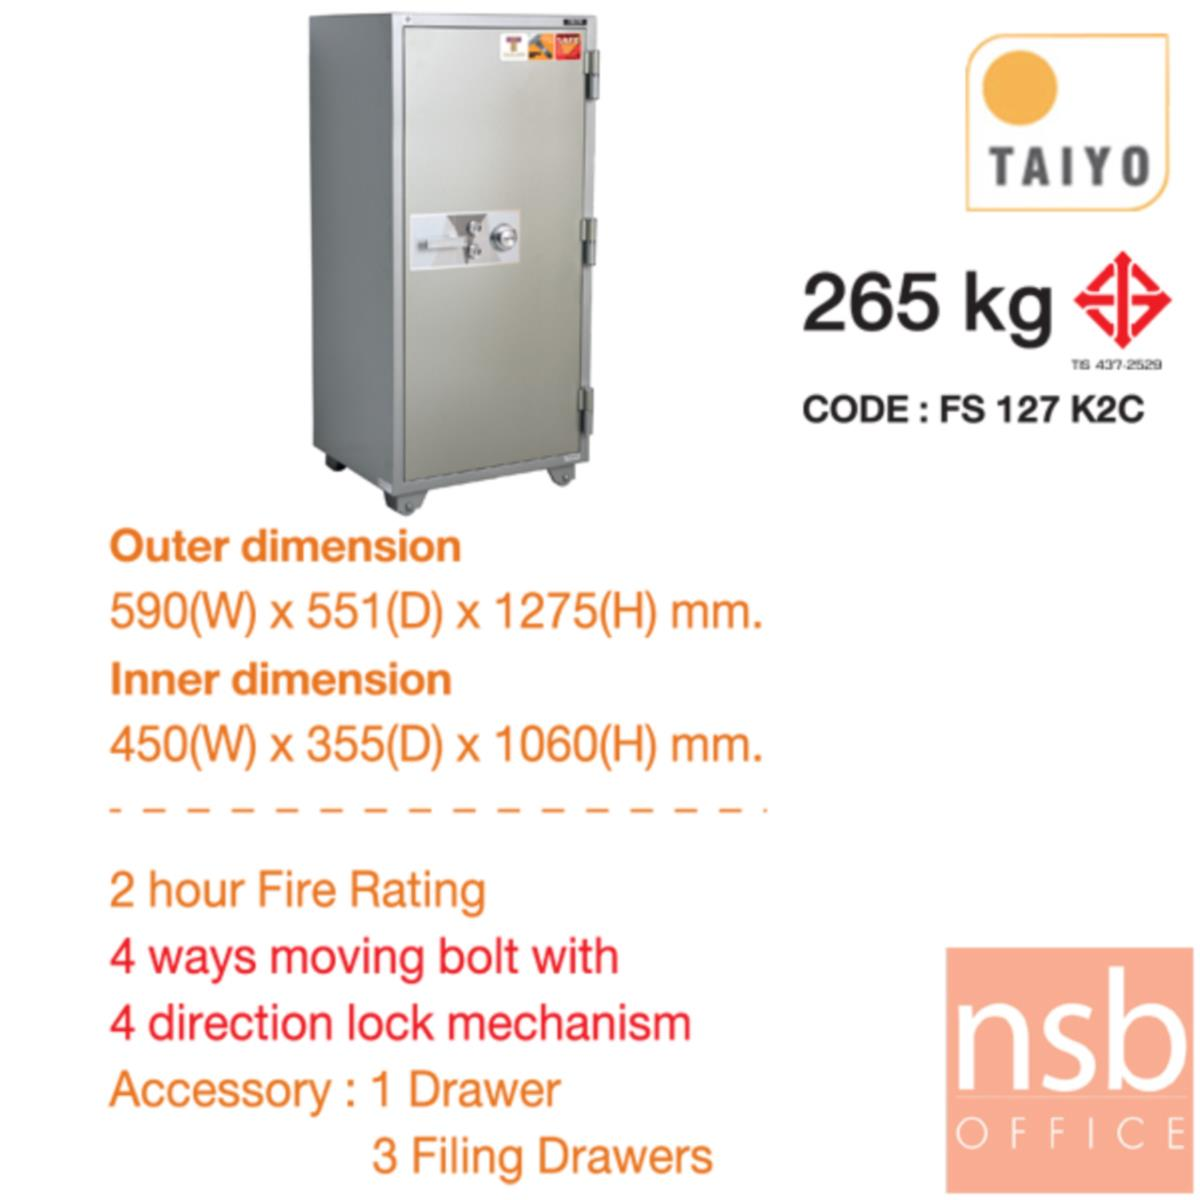 TAIYO Hanging File 265 กก. 2 กุญแจ 1 รหัส (FS 127 K2C มอก.)